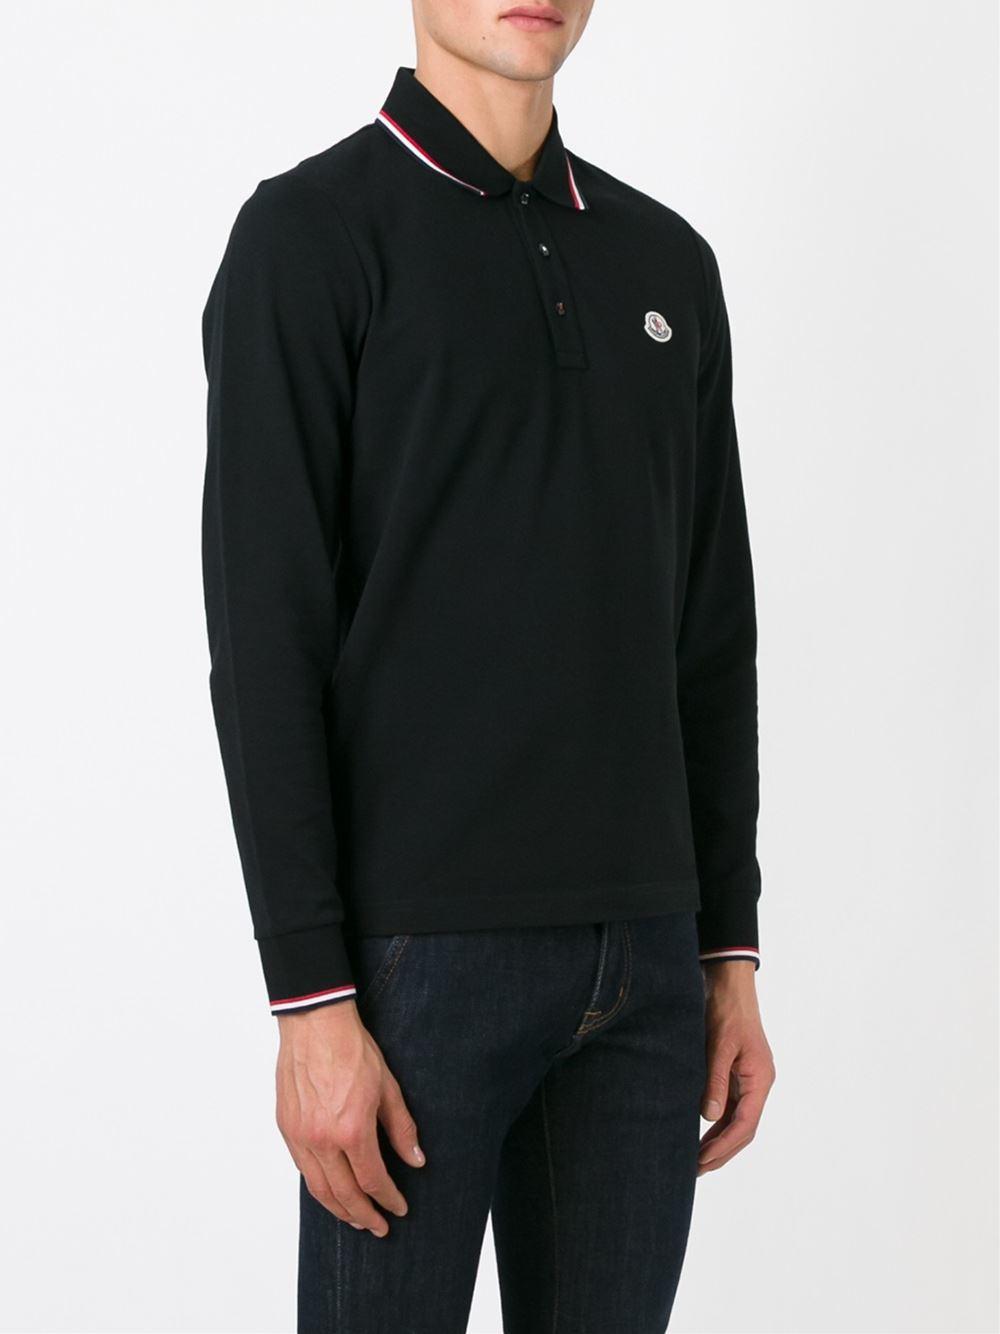 Moncler Long Sleeve Polo Shirt In Black For Men Lyst